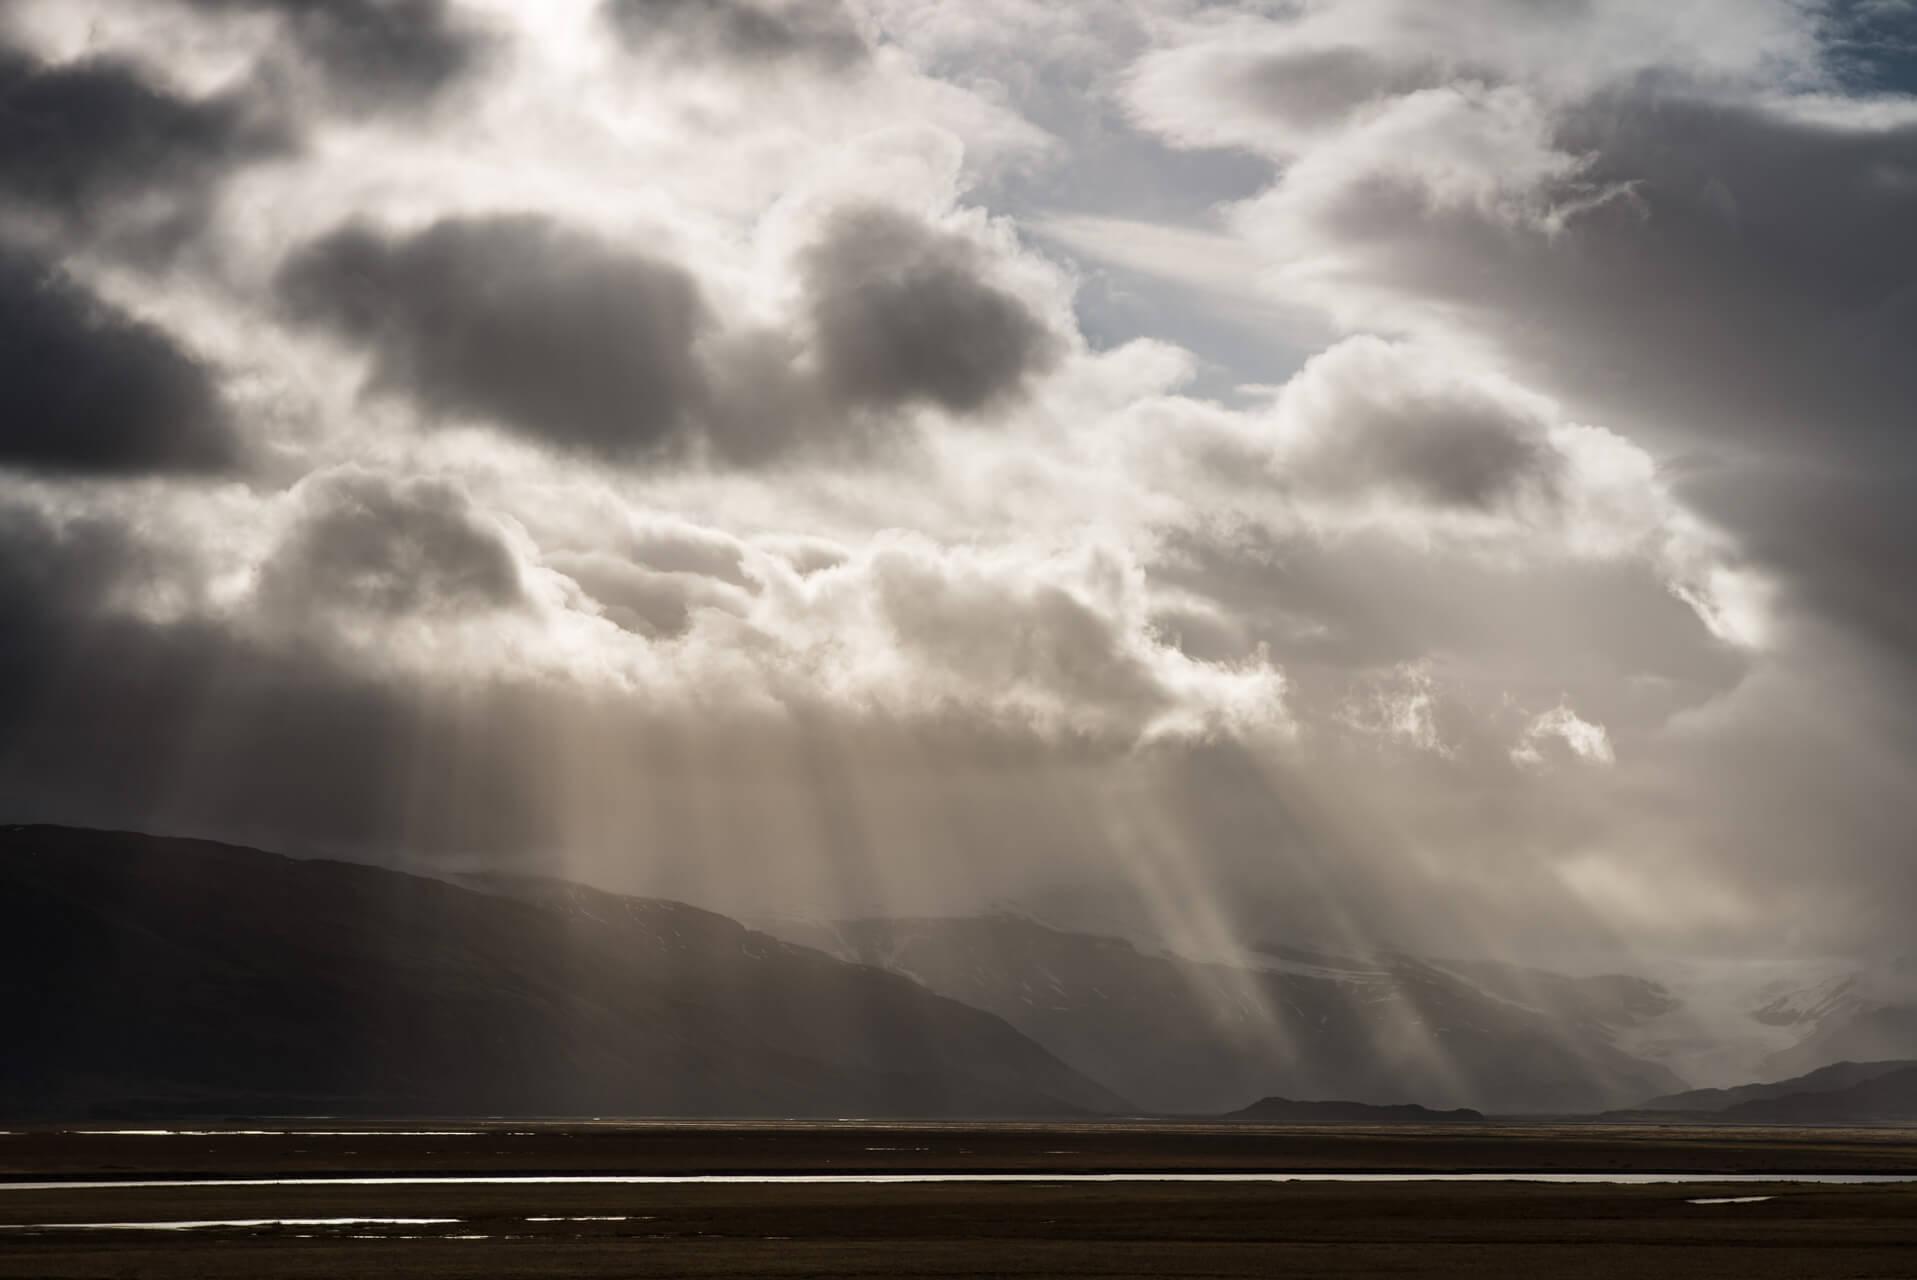 Island, Mai 2013; Fotograf Steffen Lohse